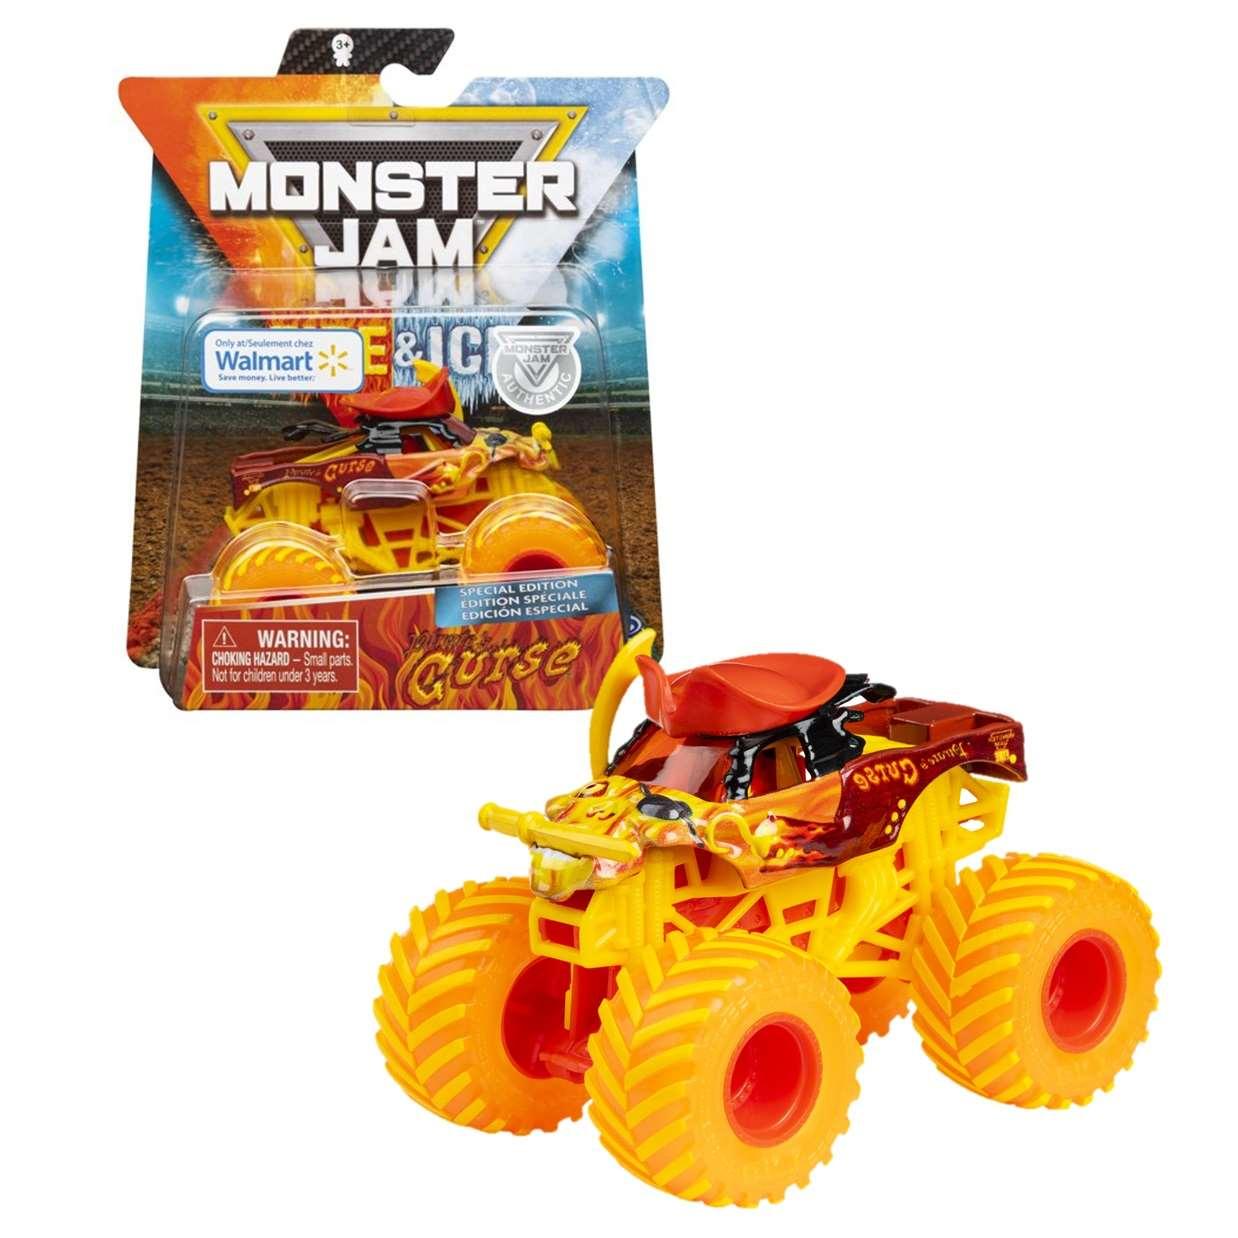 Pirates Curse 1/64 Monster Jam Fire & Ice Exclusivo Walmart